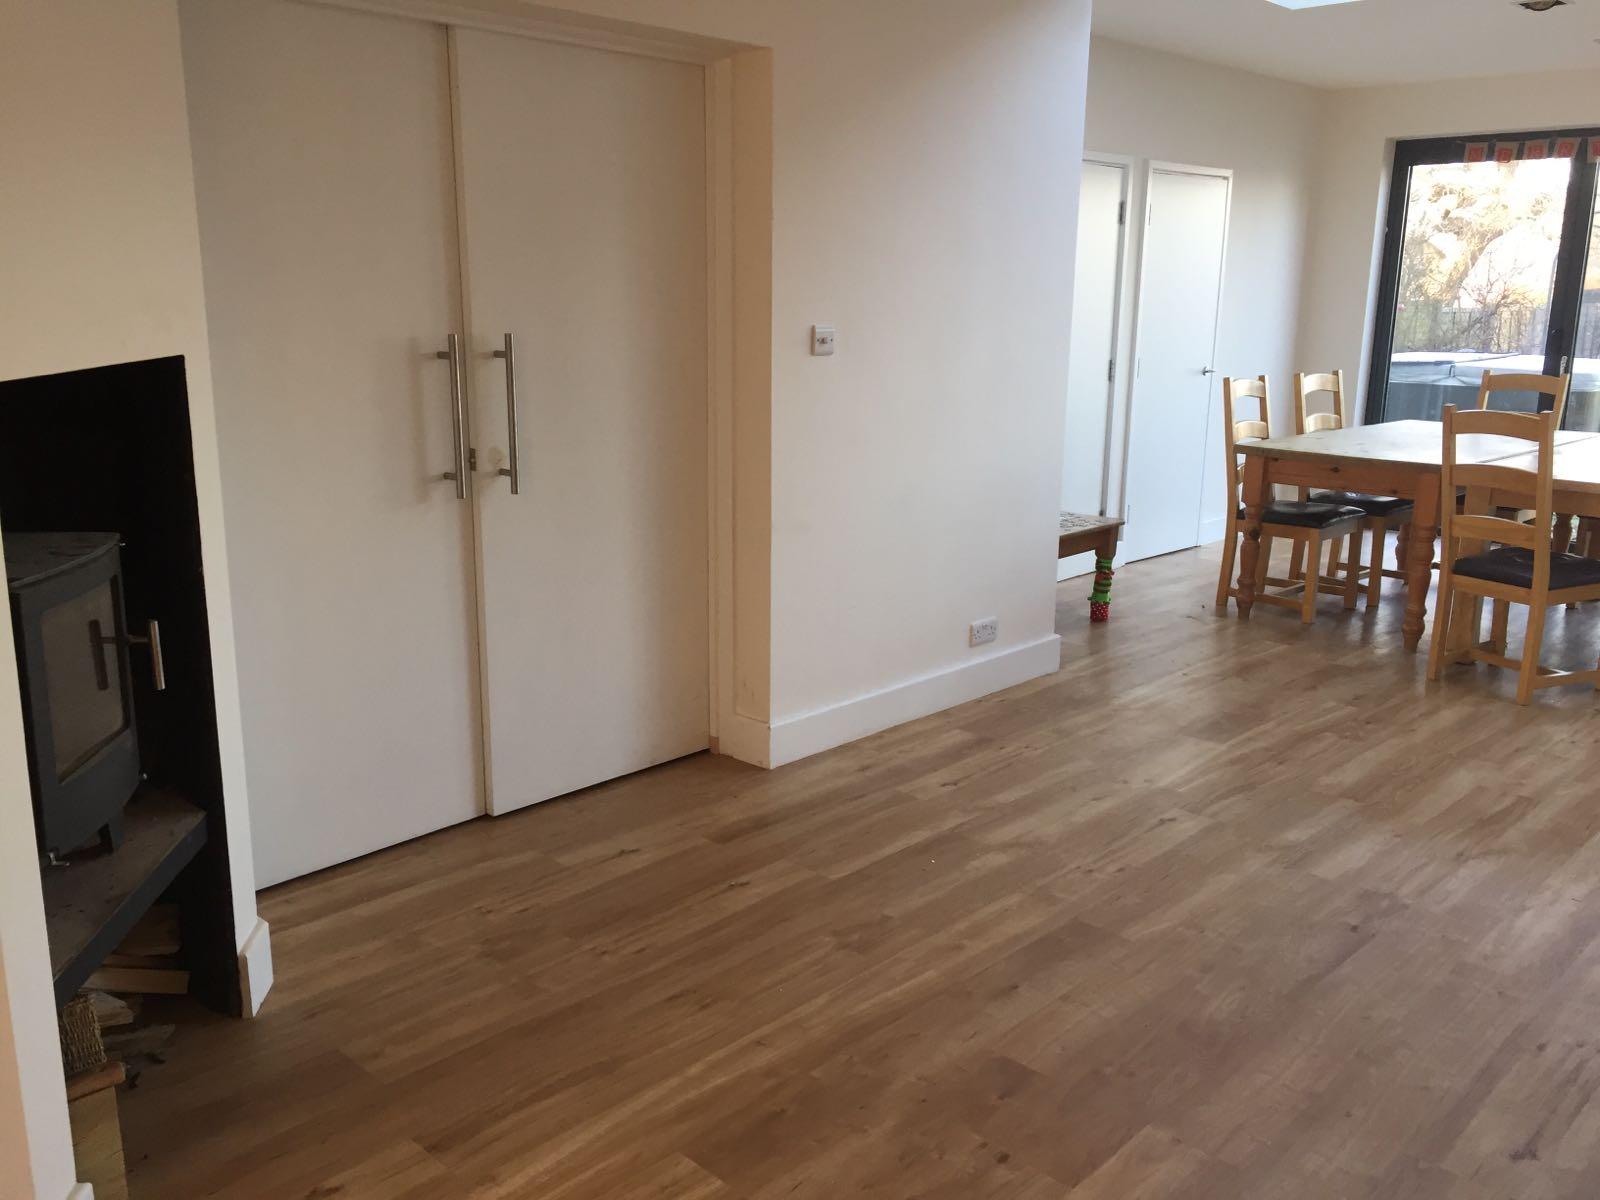 Wood Floor - Inspiral Flooring Services